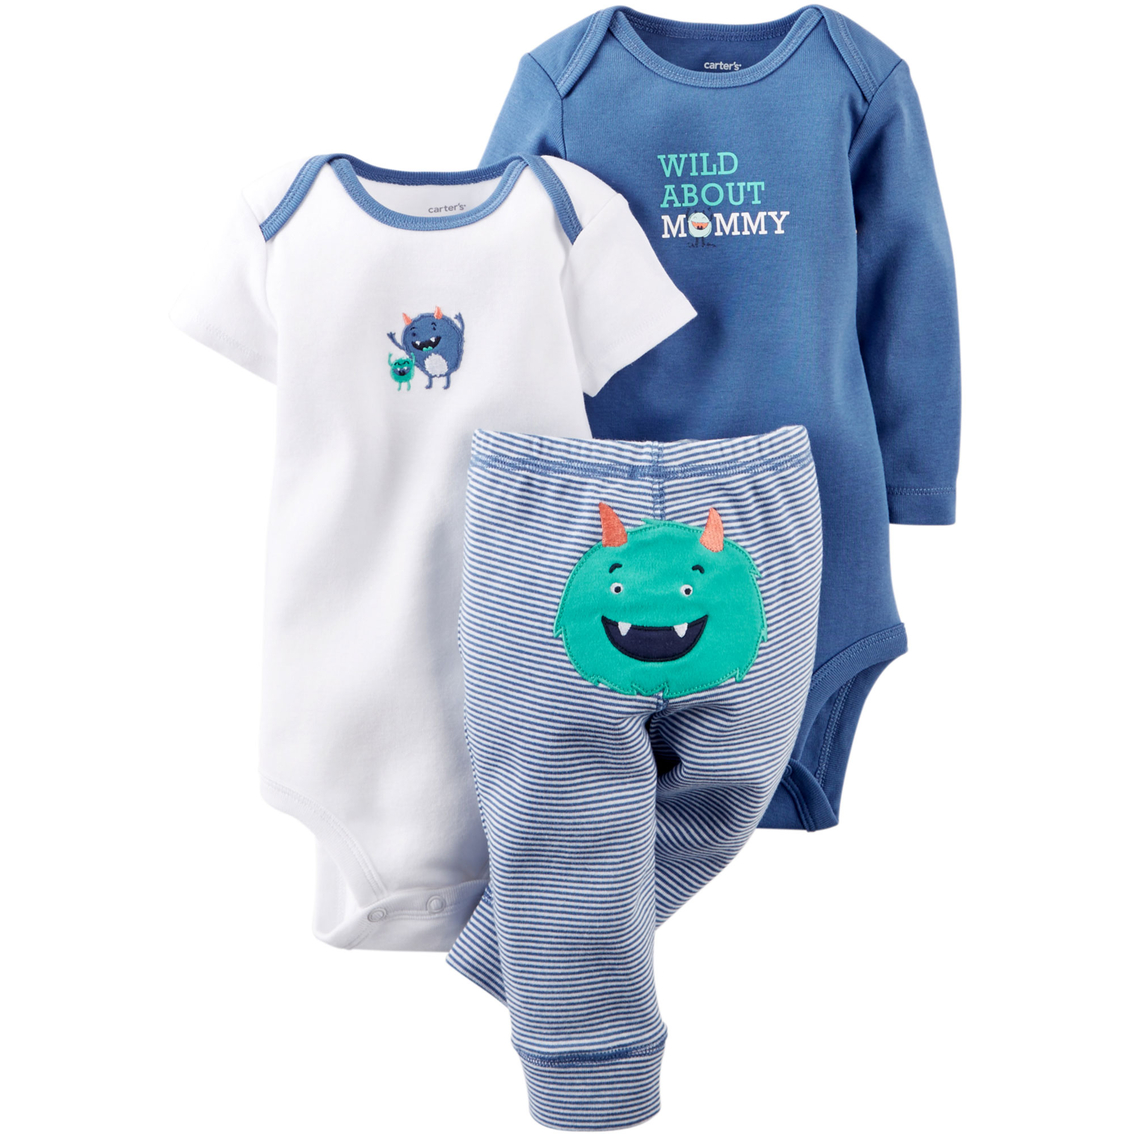 d26433c40f89b Carter's Infant Boys Turn Me Around Blue Monster Bodysuit and Pants 3 Pc.  Set